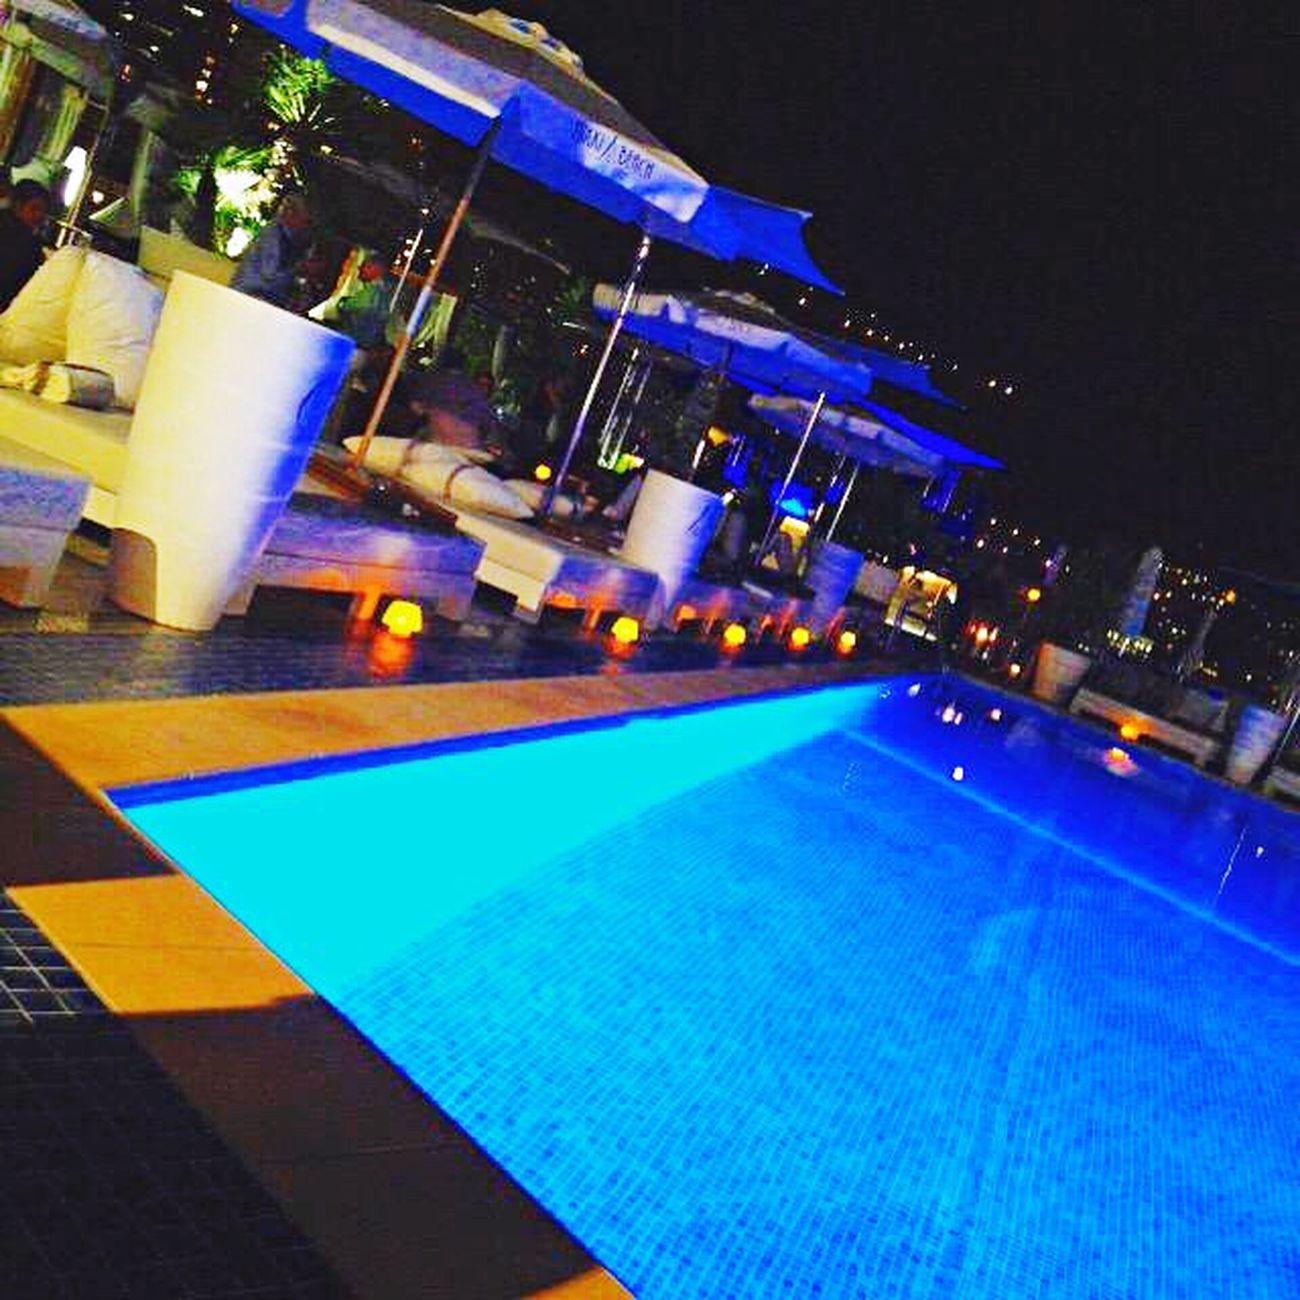 Frenchriviera Monaco Relaxing Hello World Côte D'Azur NikkiBeach Lovelife Tudodebom Tudopago Socute Mybabyandme